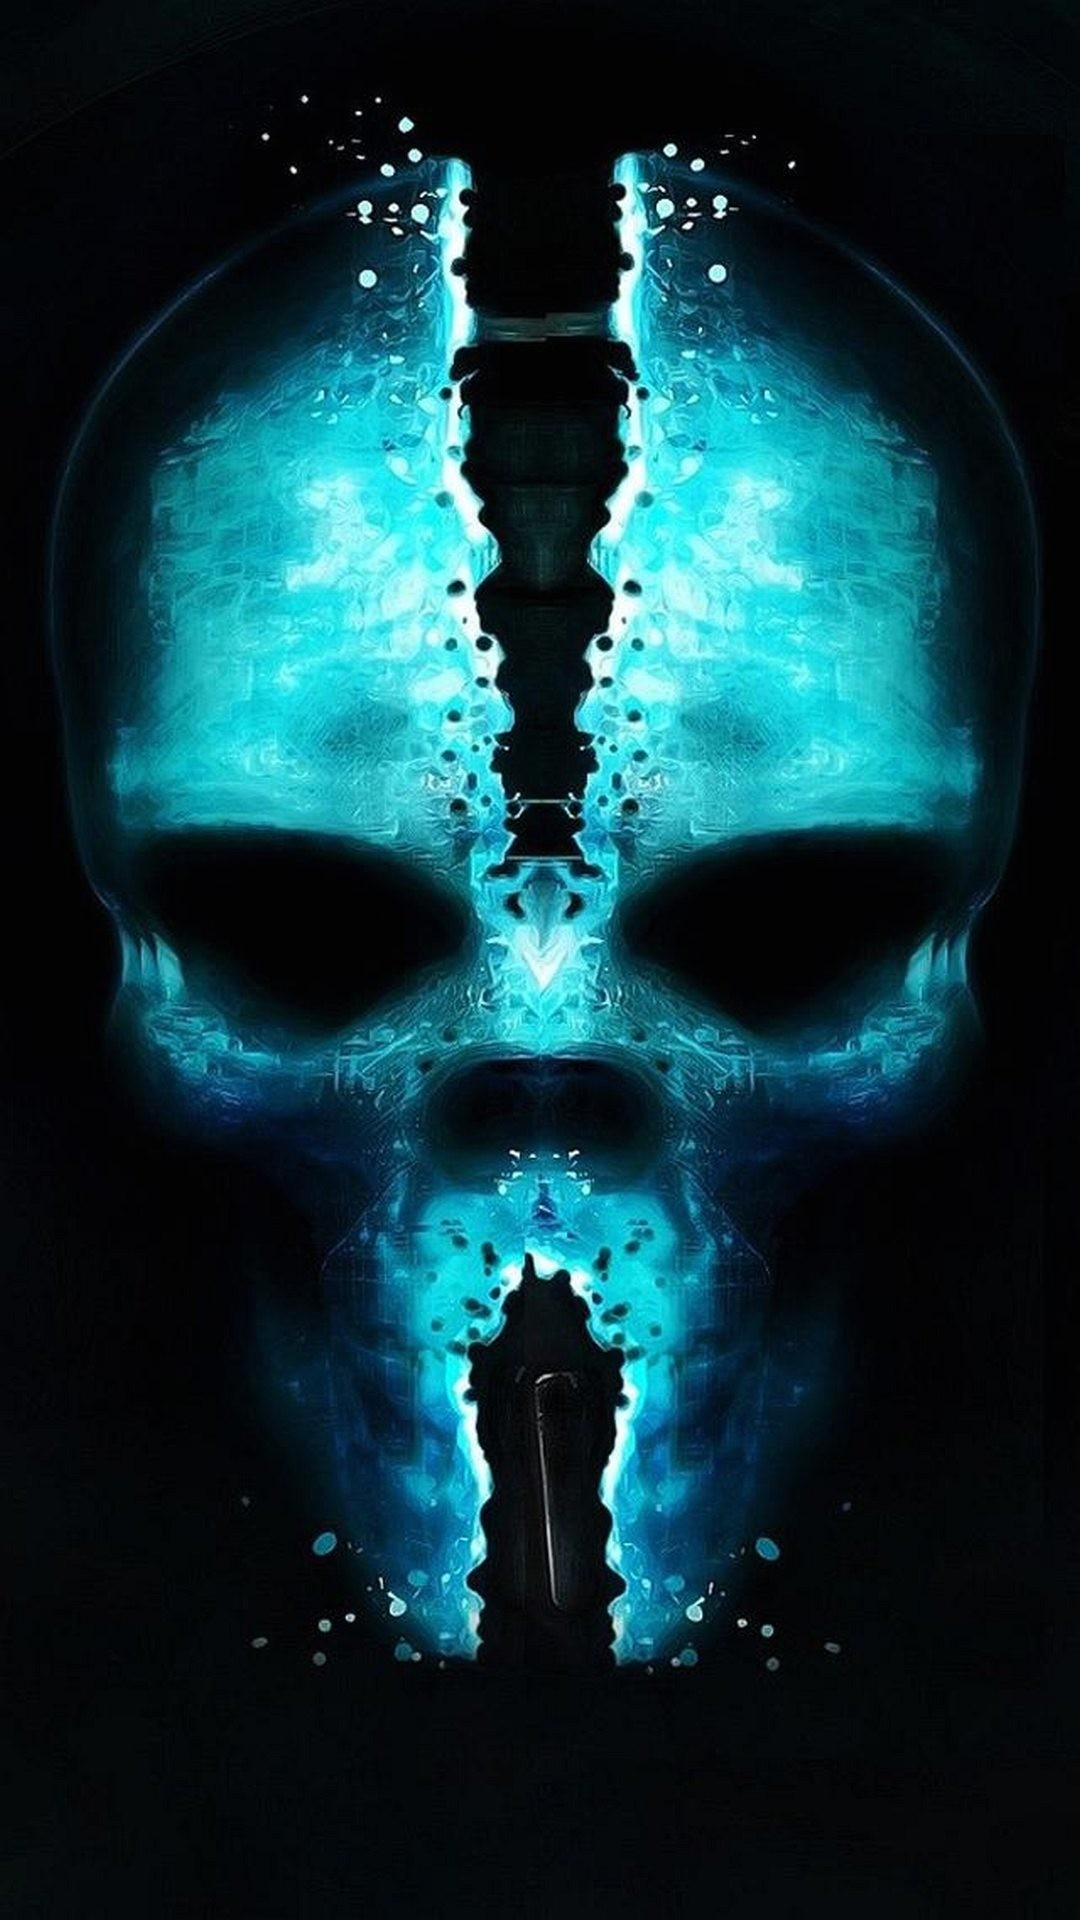 Badass skull wallpaper 68 images for Sfondi per cellulare gratis